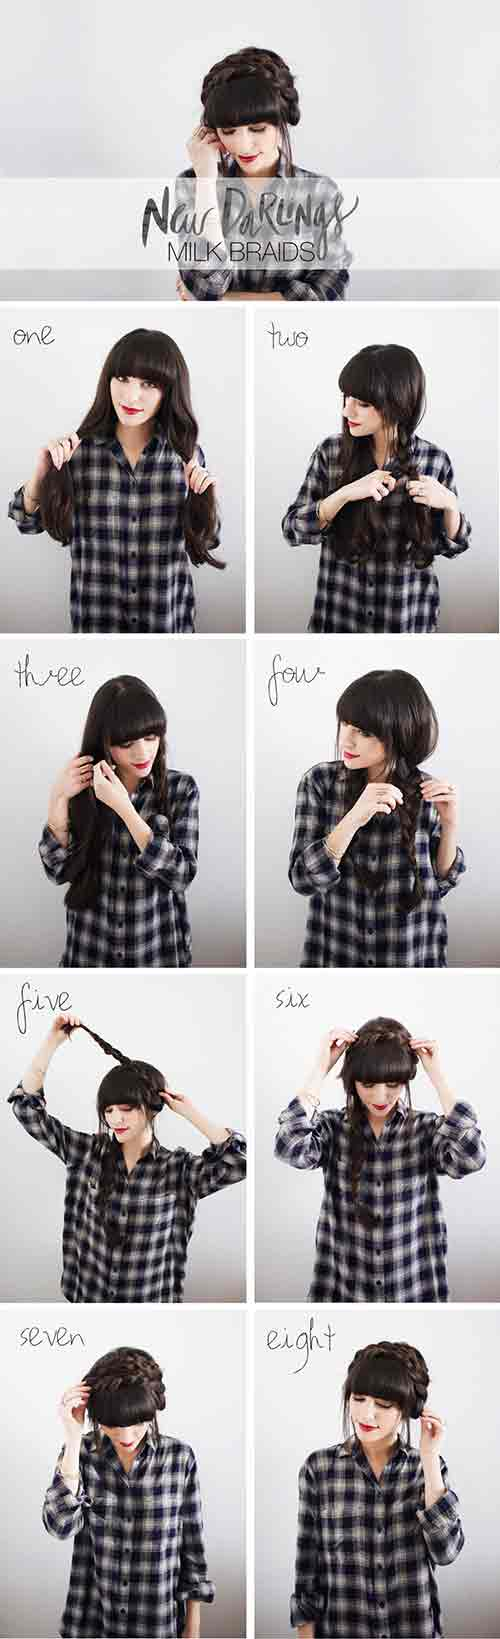 10. Milkmaid Braids